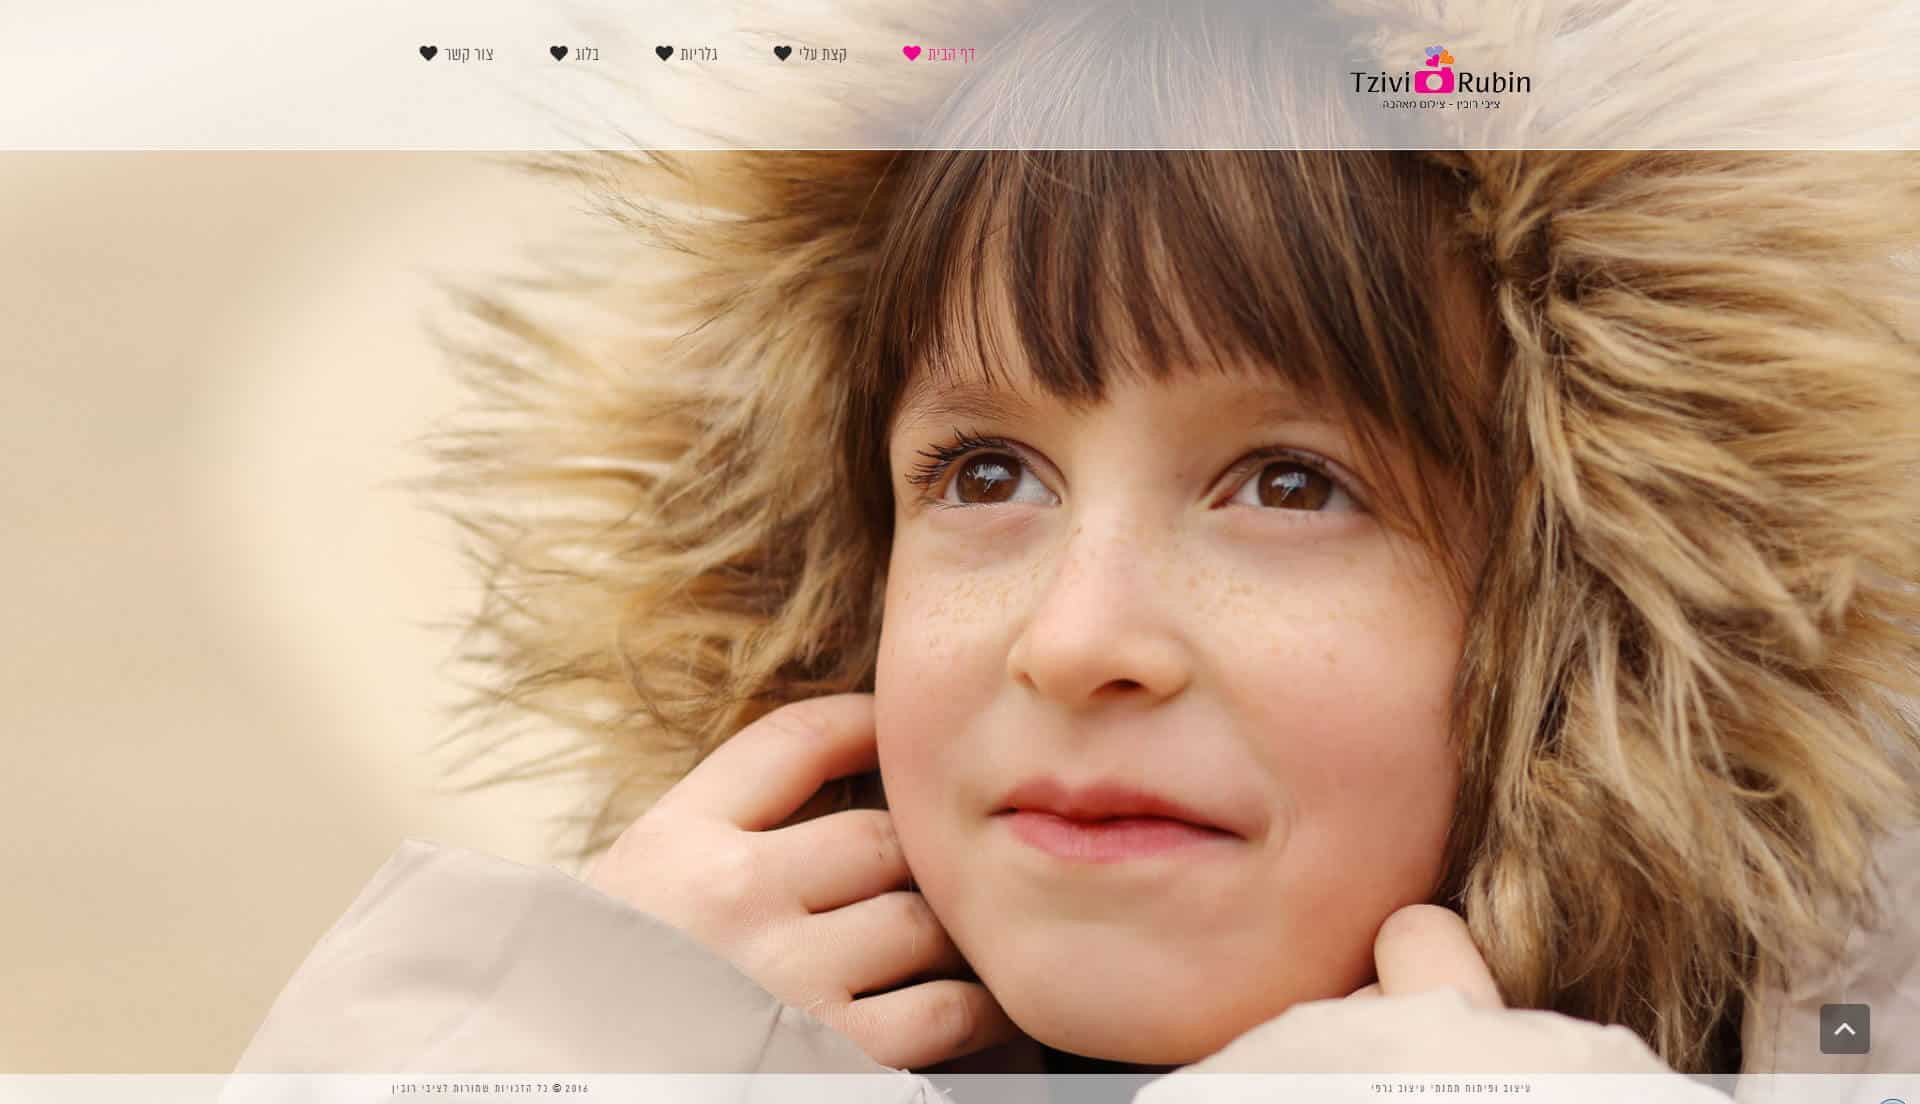 zivi-rubin-homepage